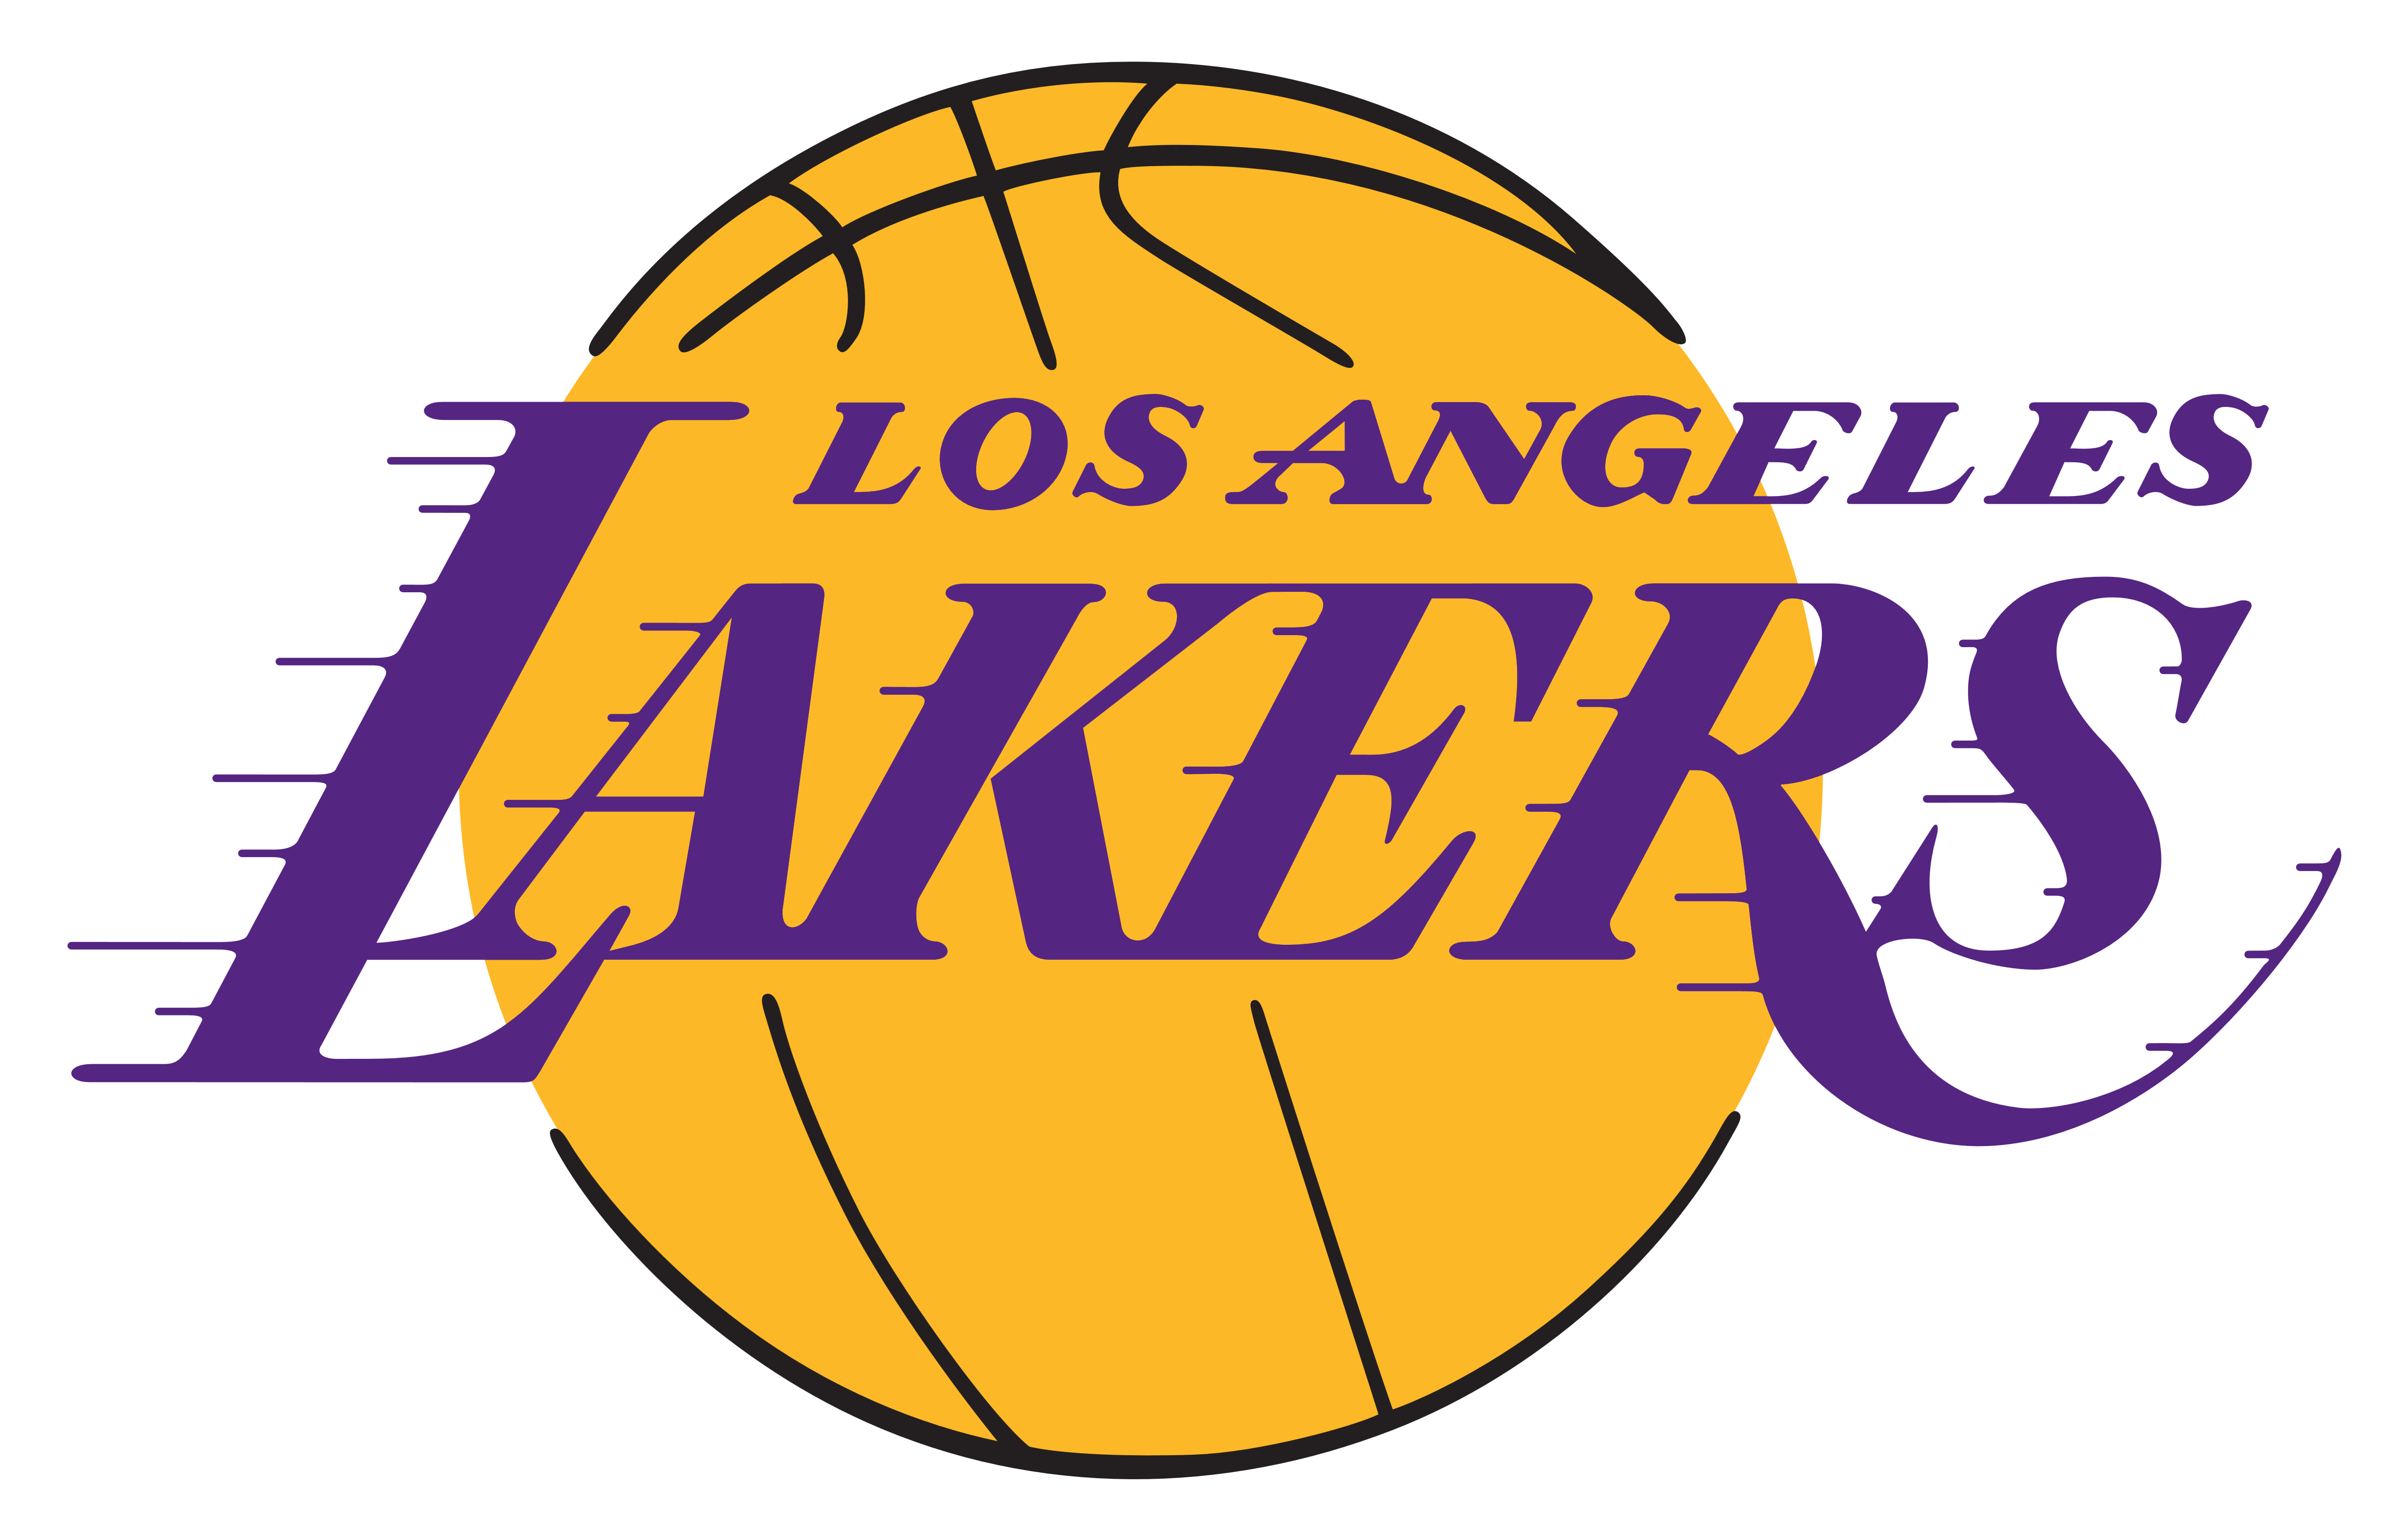 Los Angeles Lakers – Logos Download